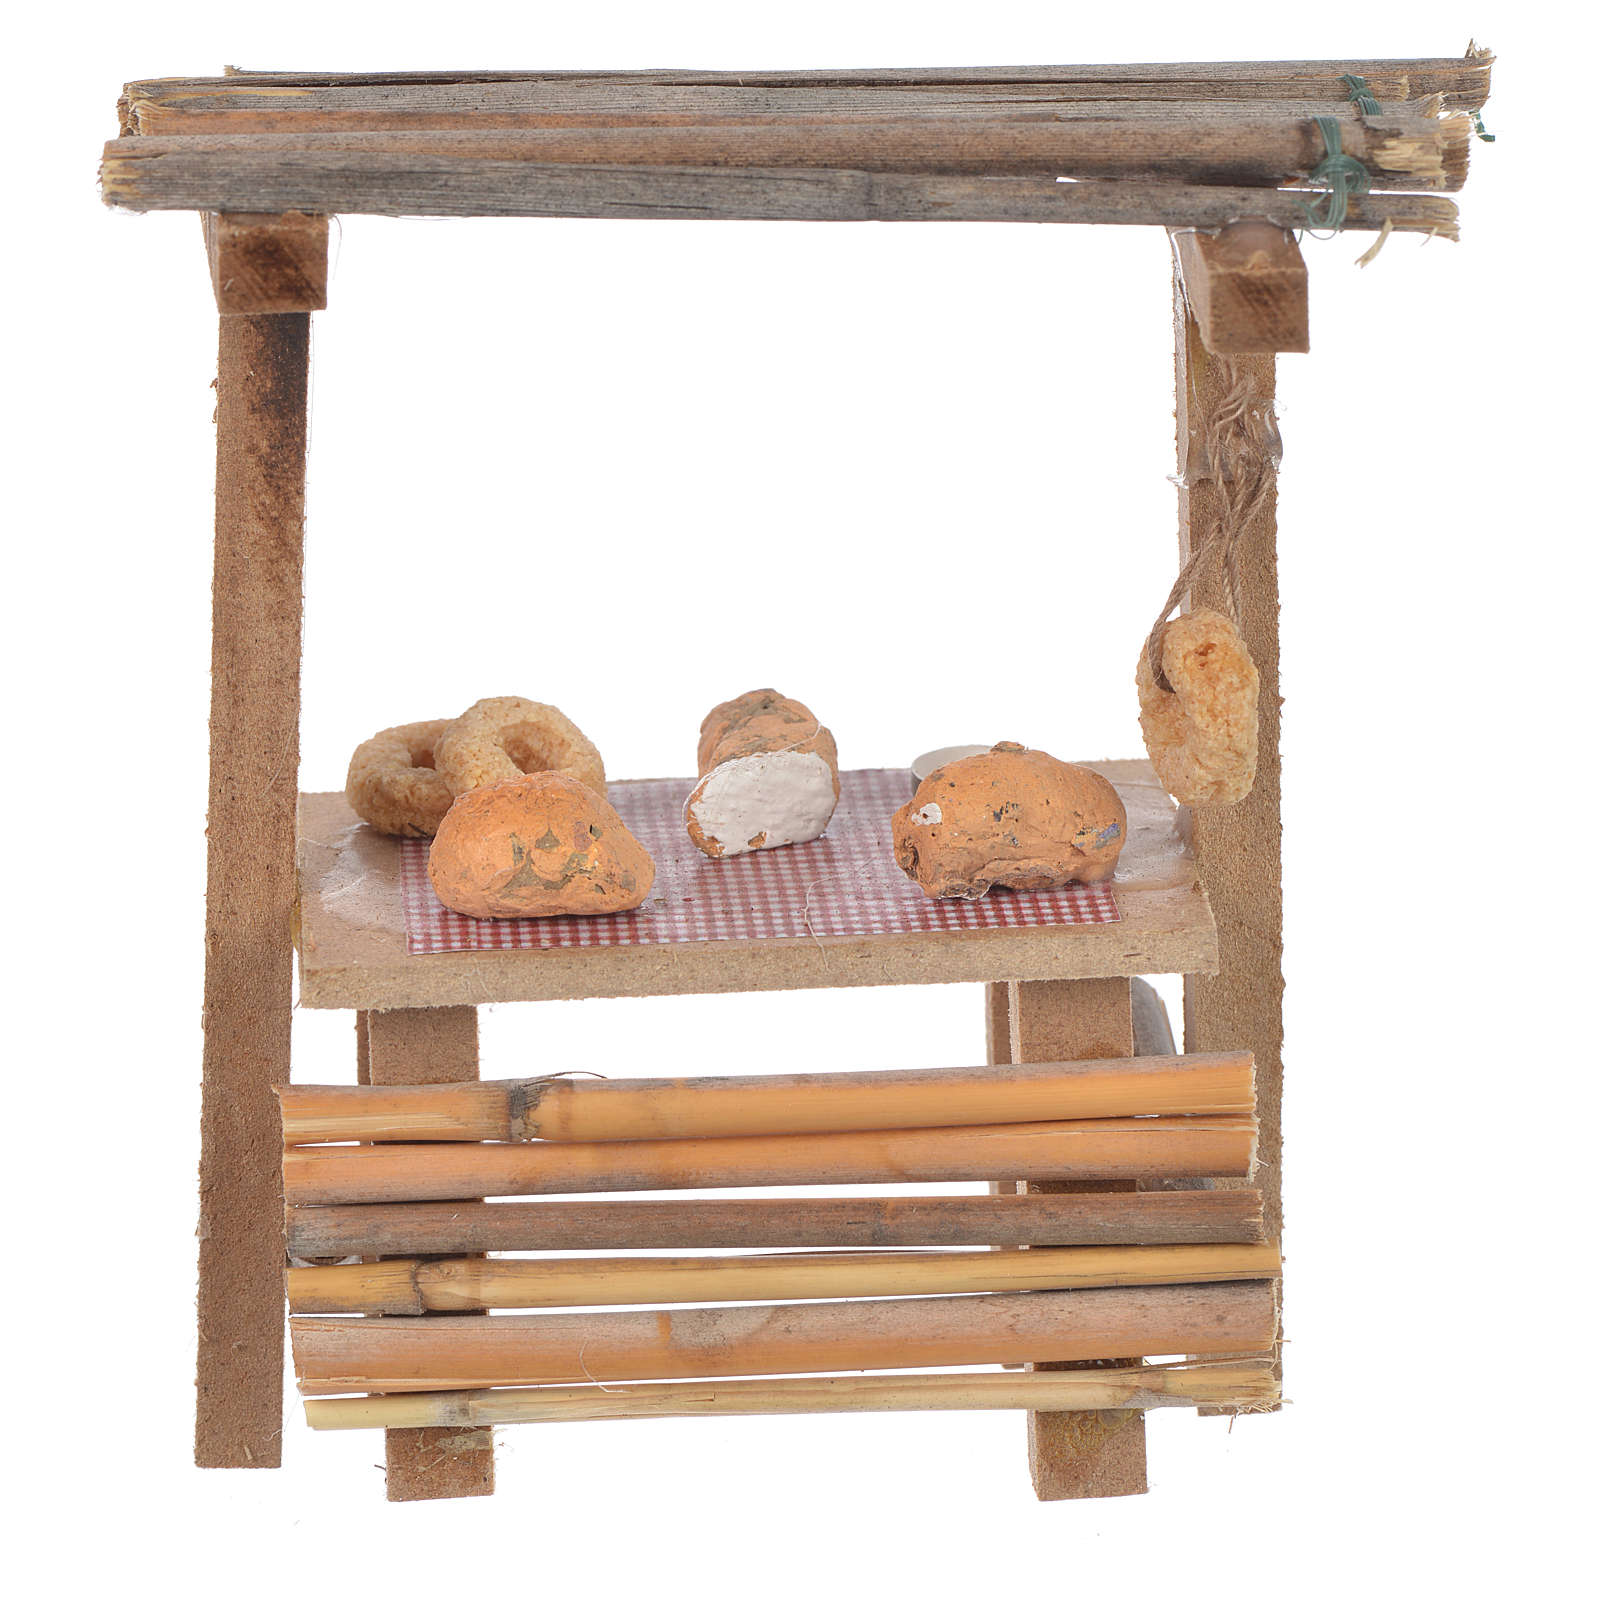 Banco legno pane cera presepe 9x10x4,5 cm 4